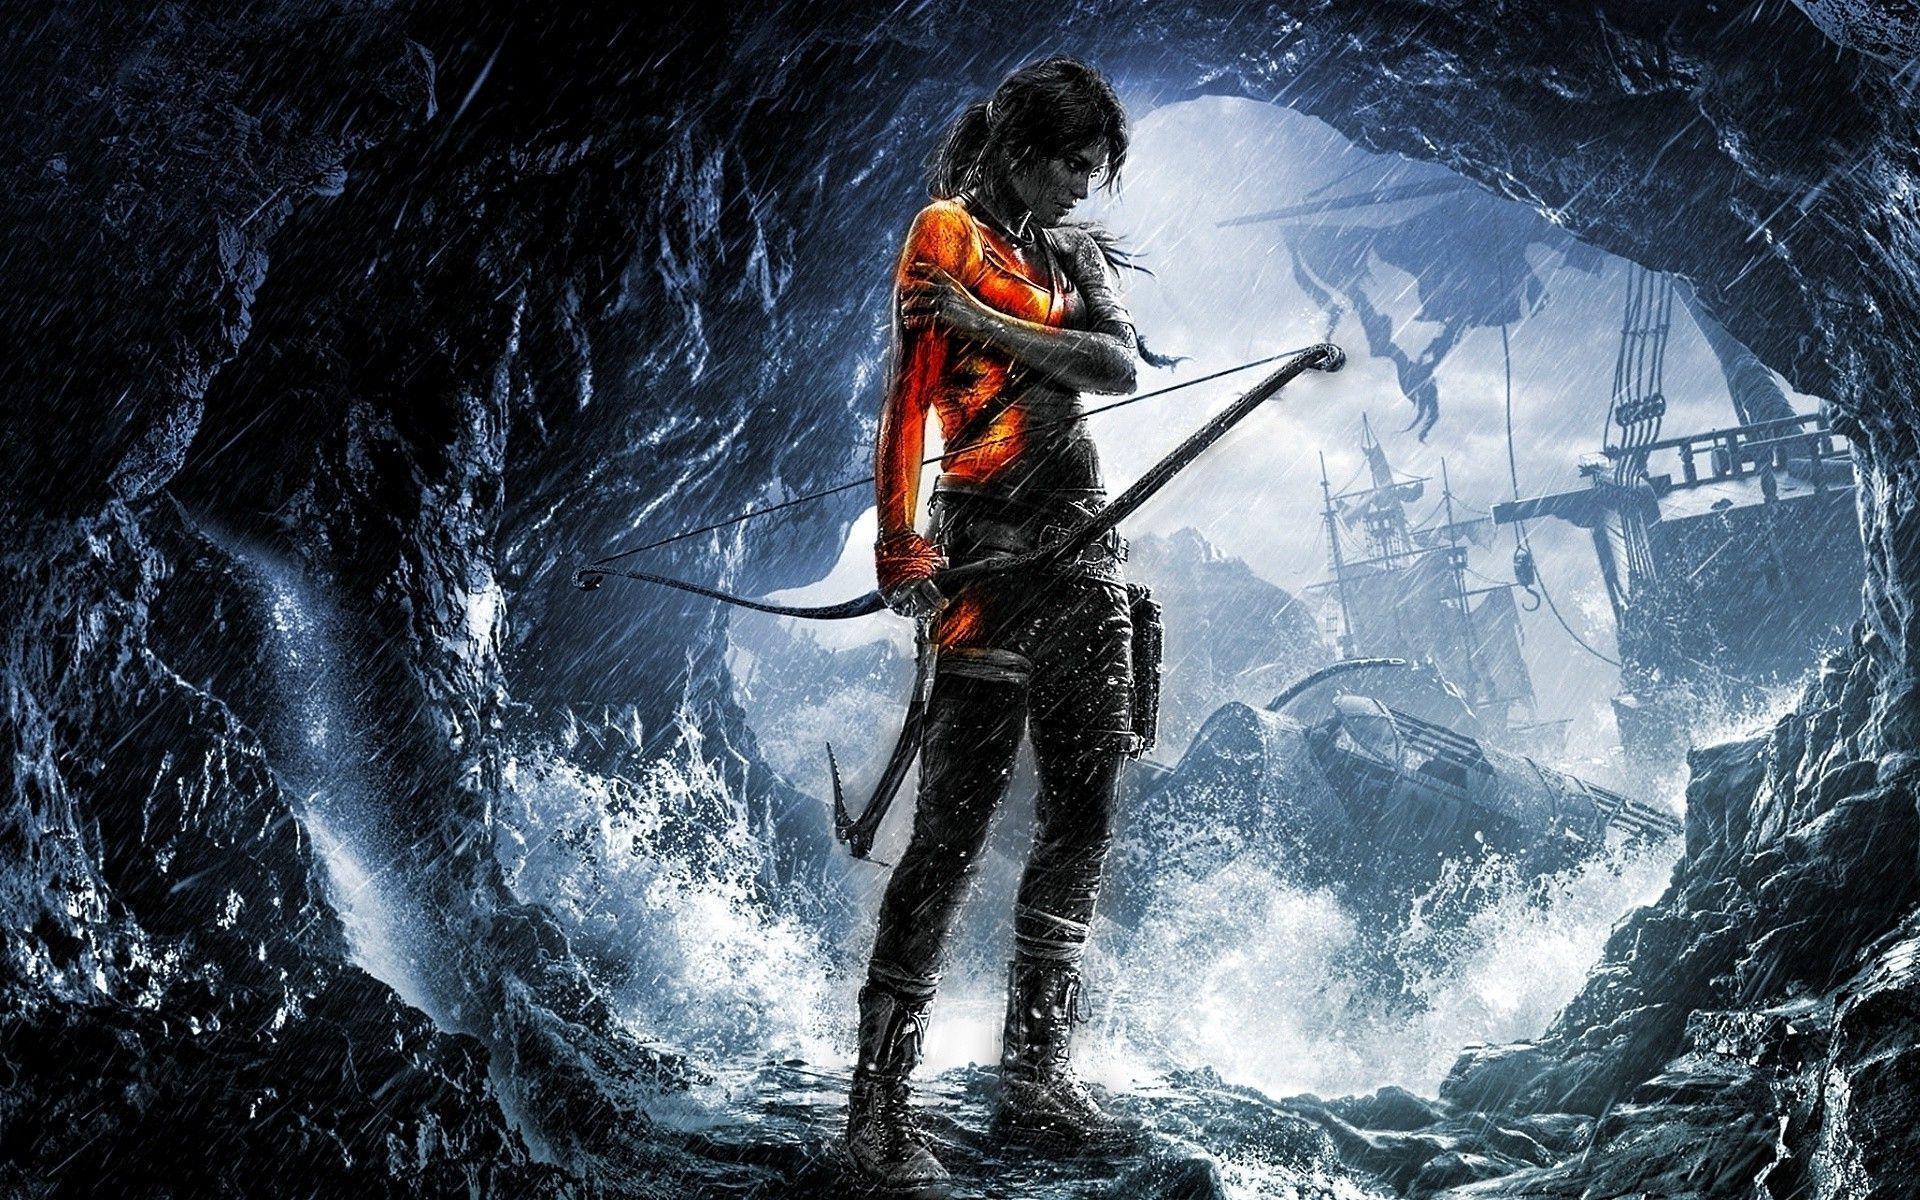 Tomb Raider 2016 Wallpapers HD - Wallpaper Cave